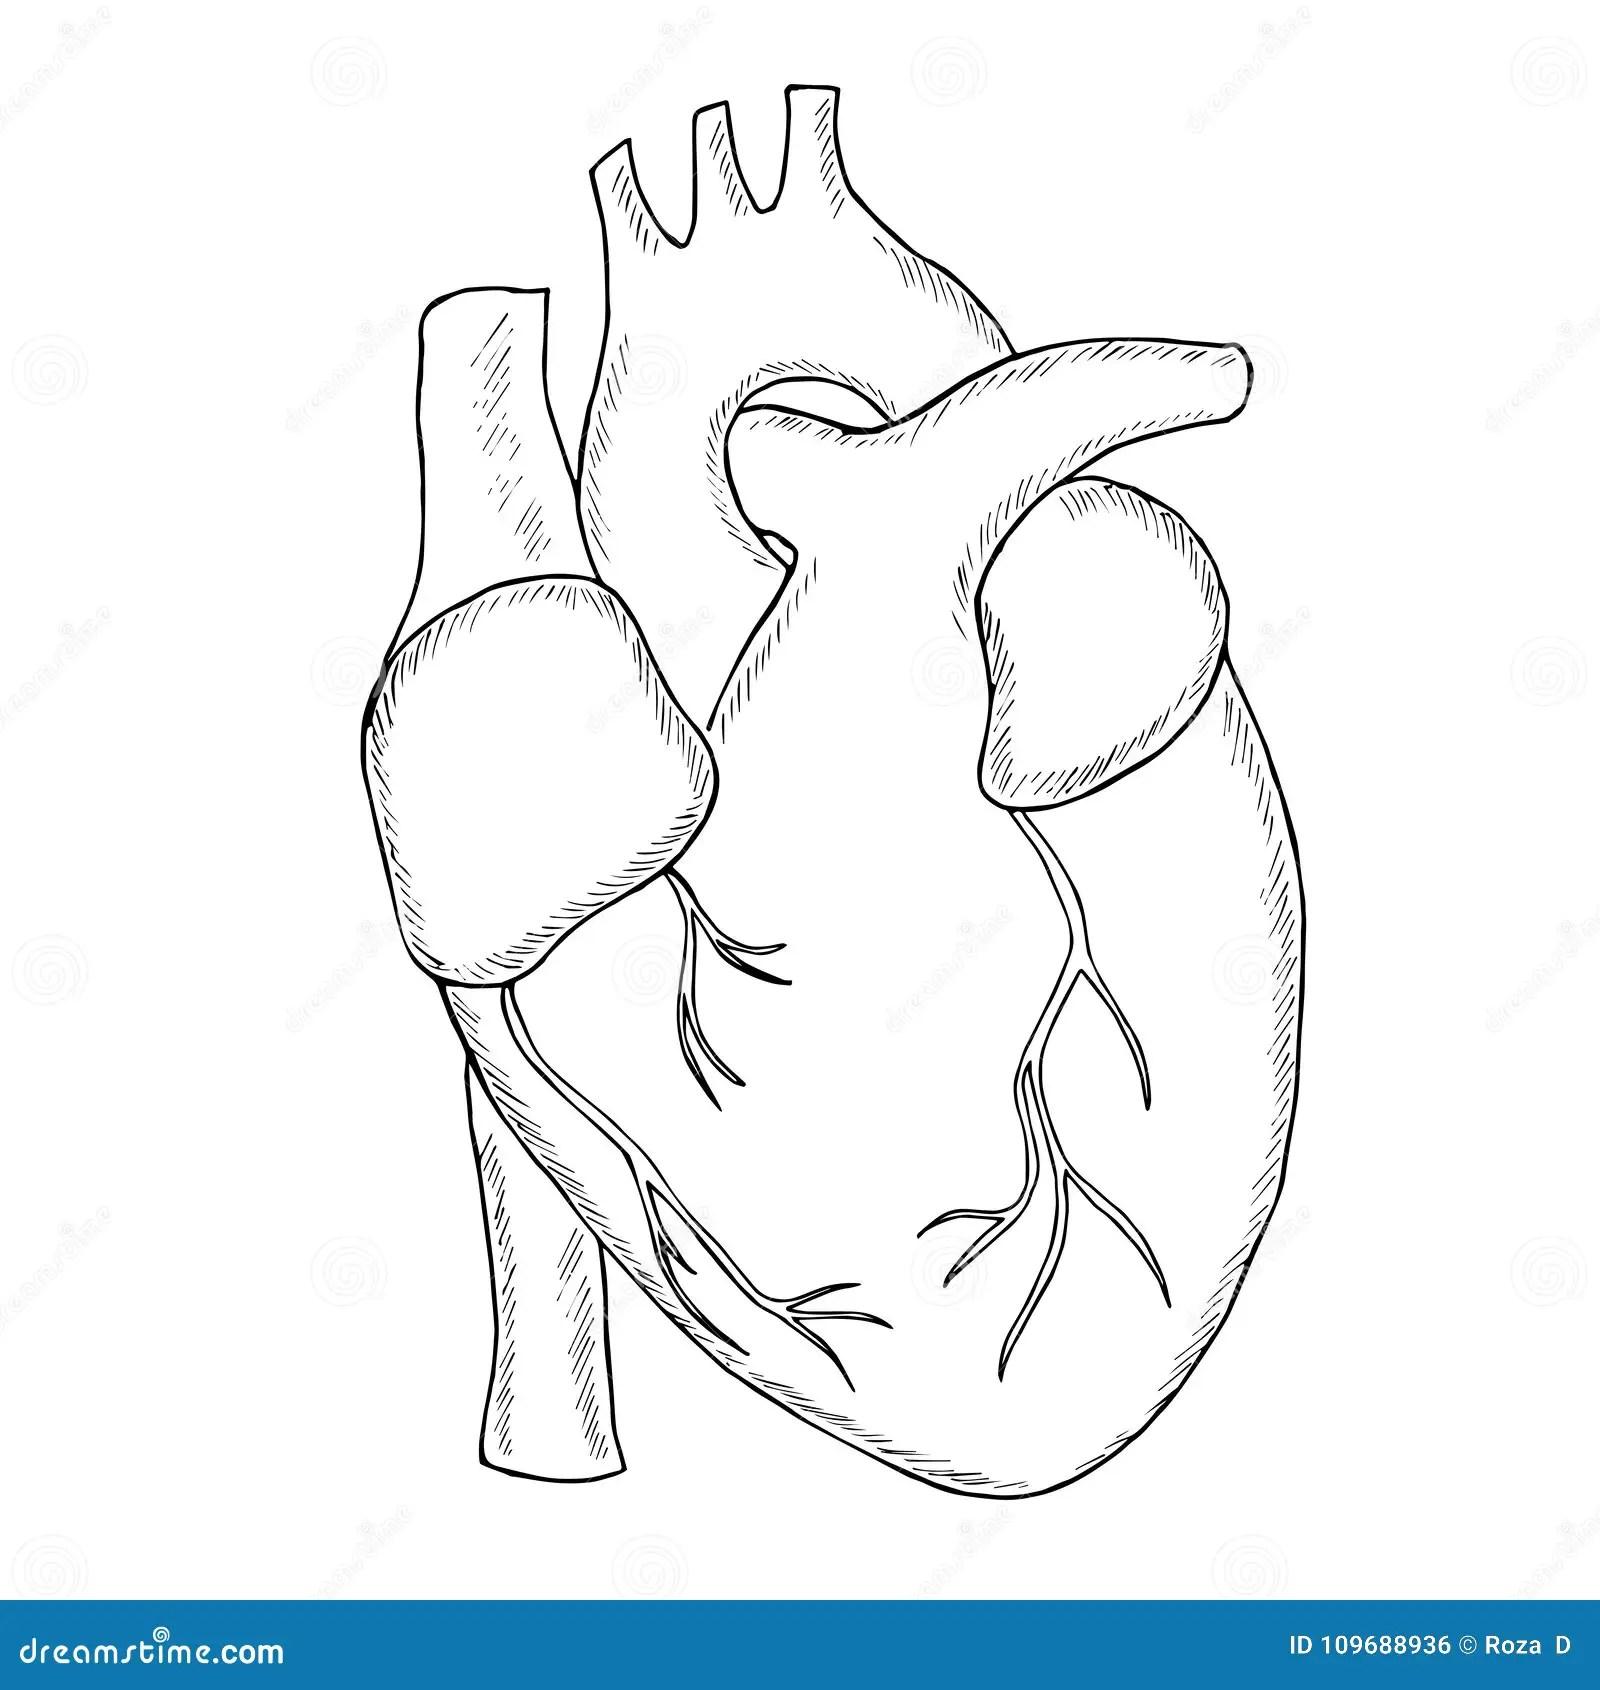 Human Heart Sketch Liner Stock Vector Illustration Of Design 109688936